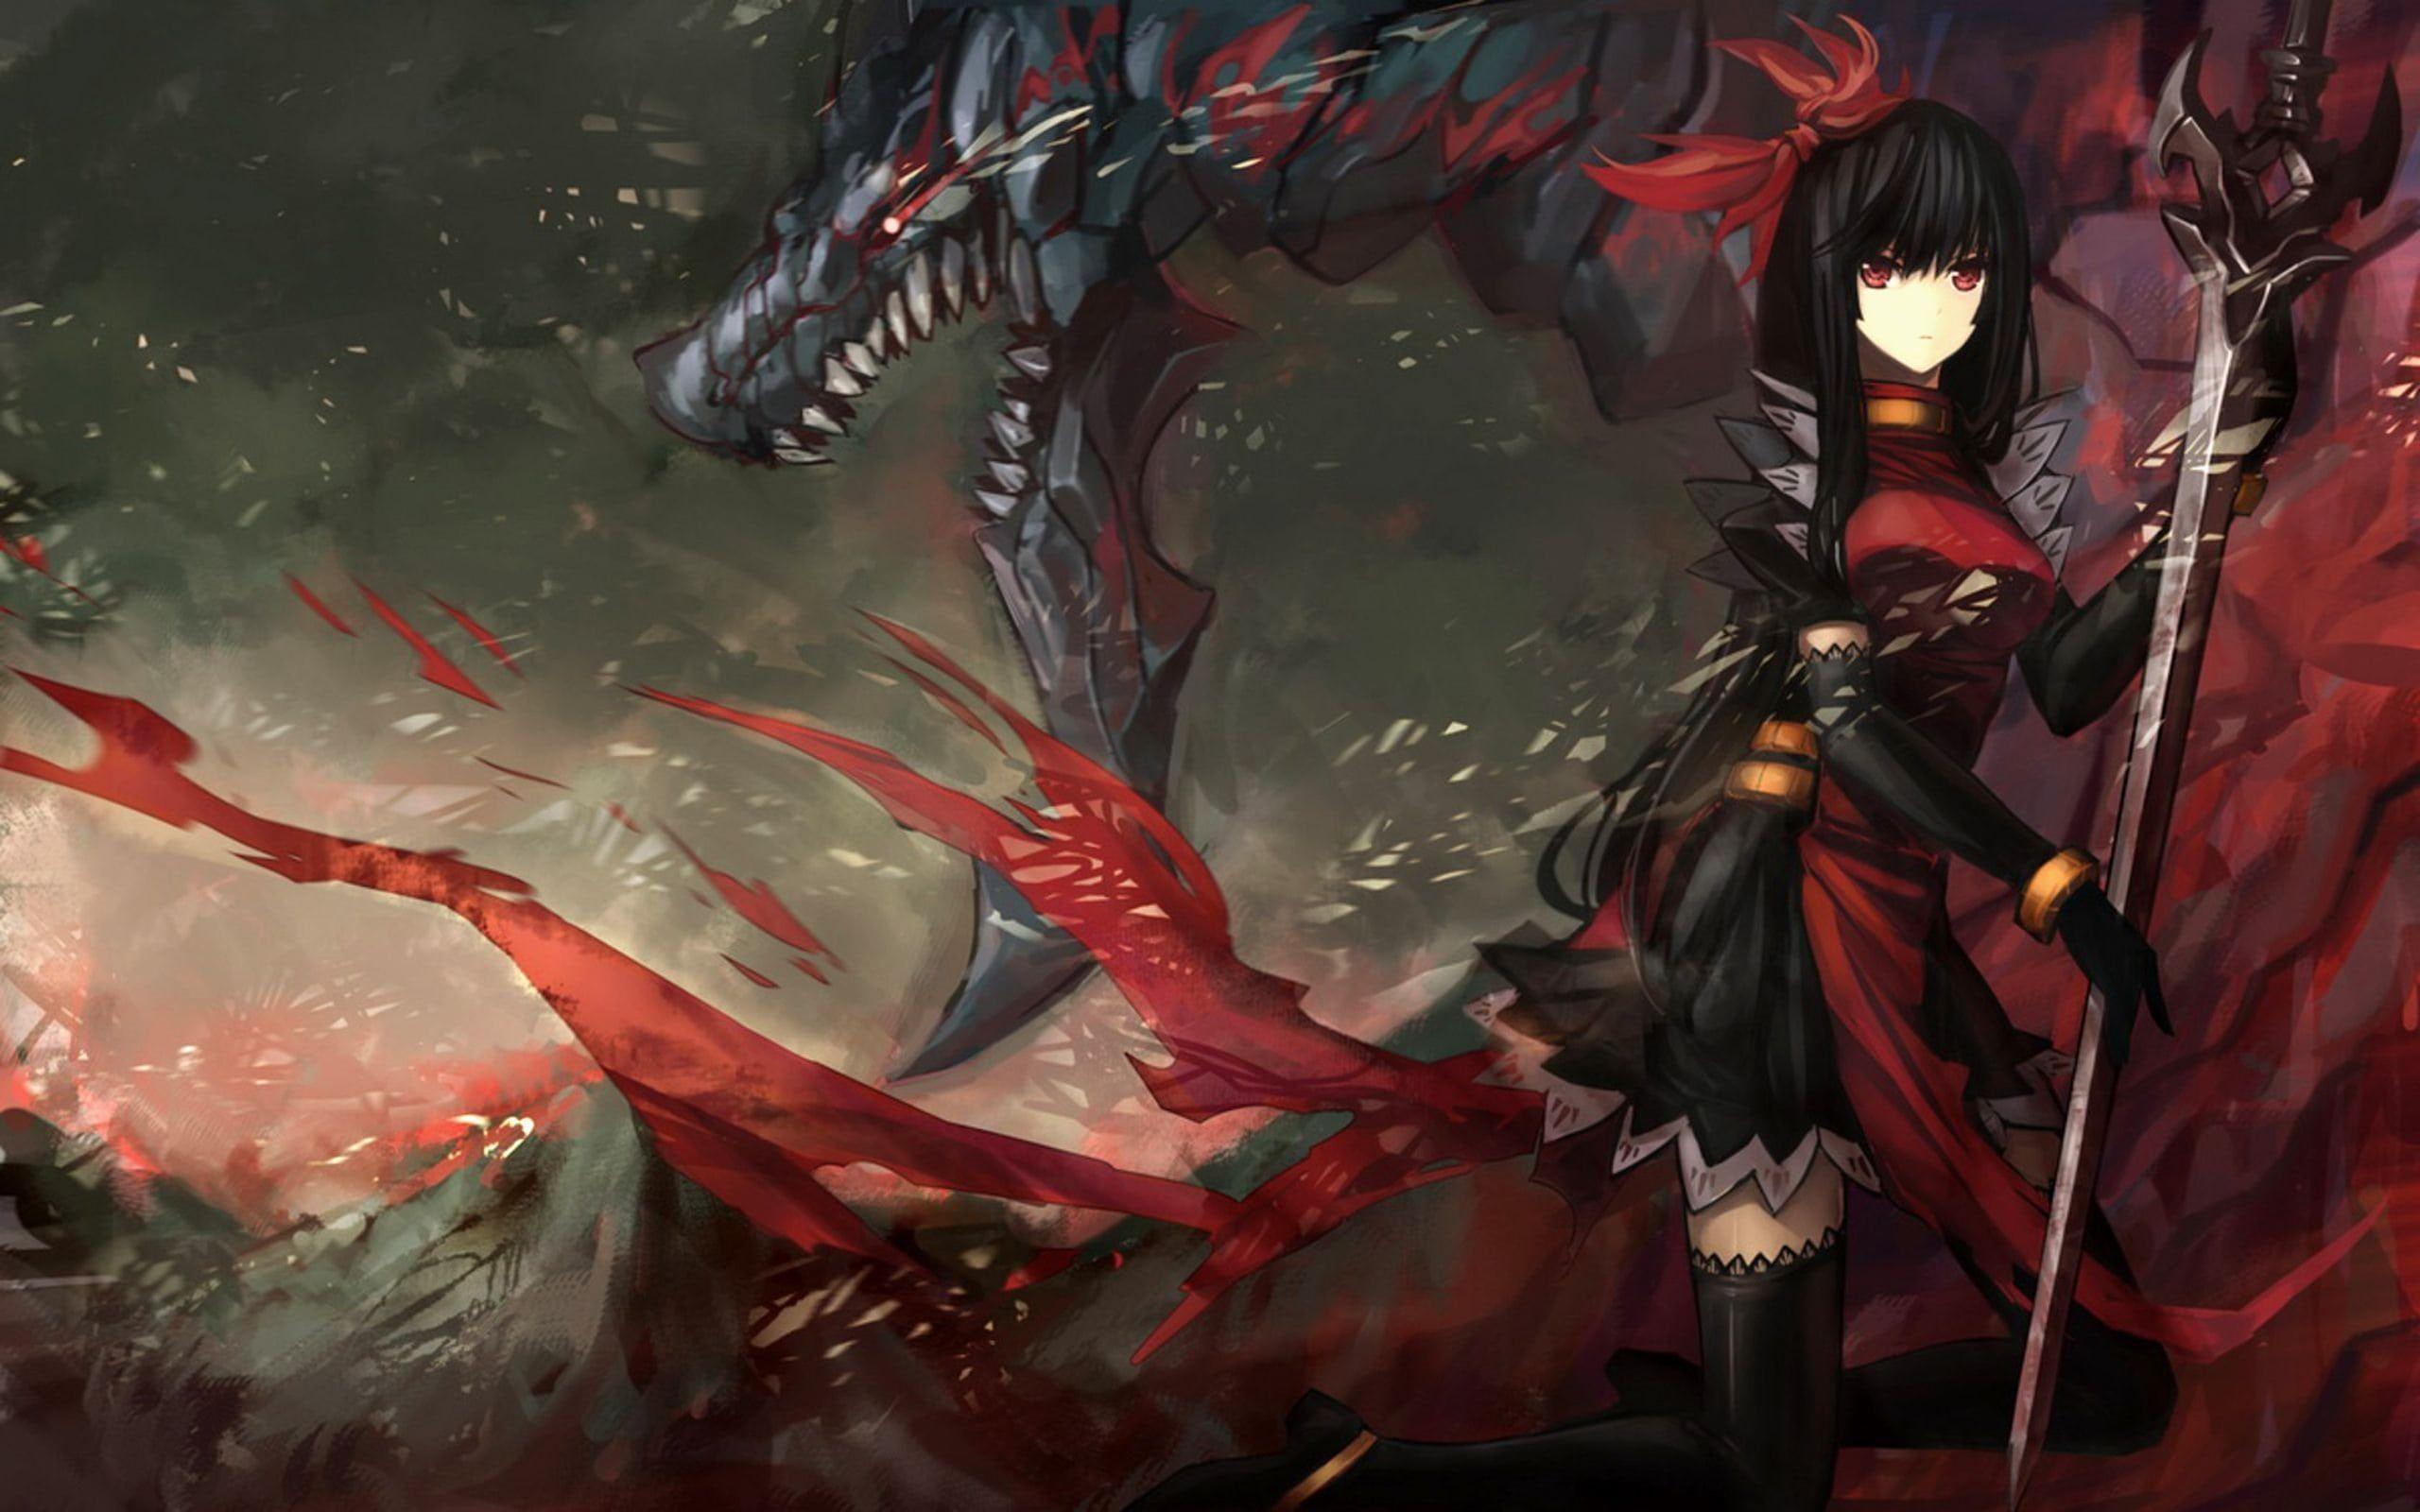 Anime Woman Warrior Sword Dragon Anime Warrior Warriors